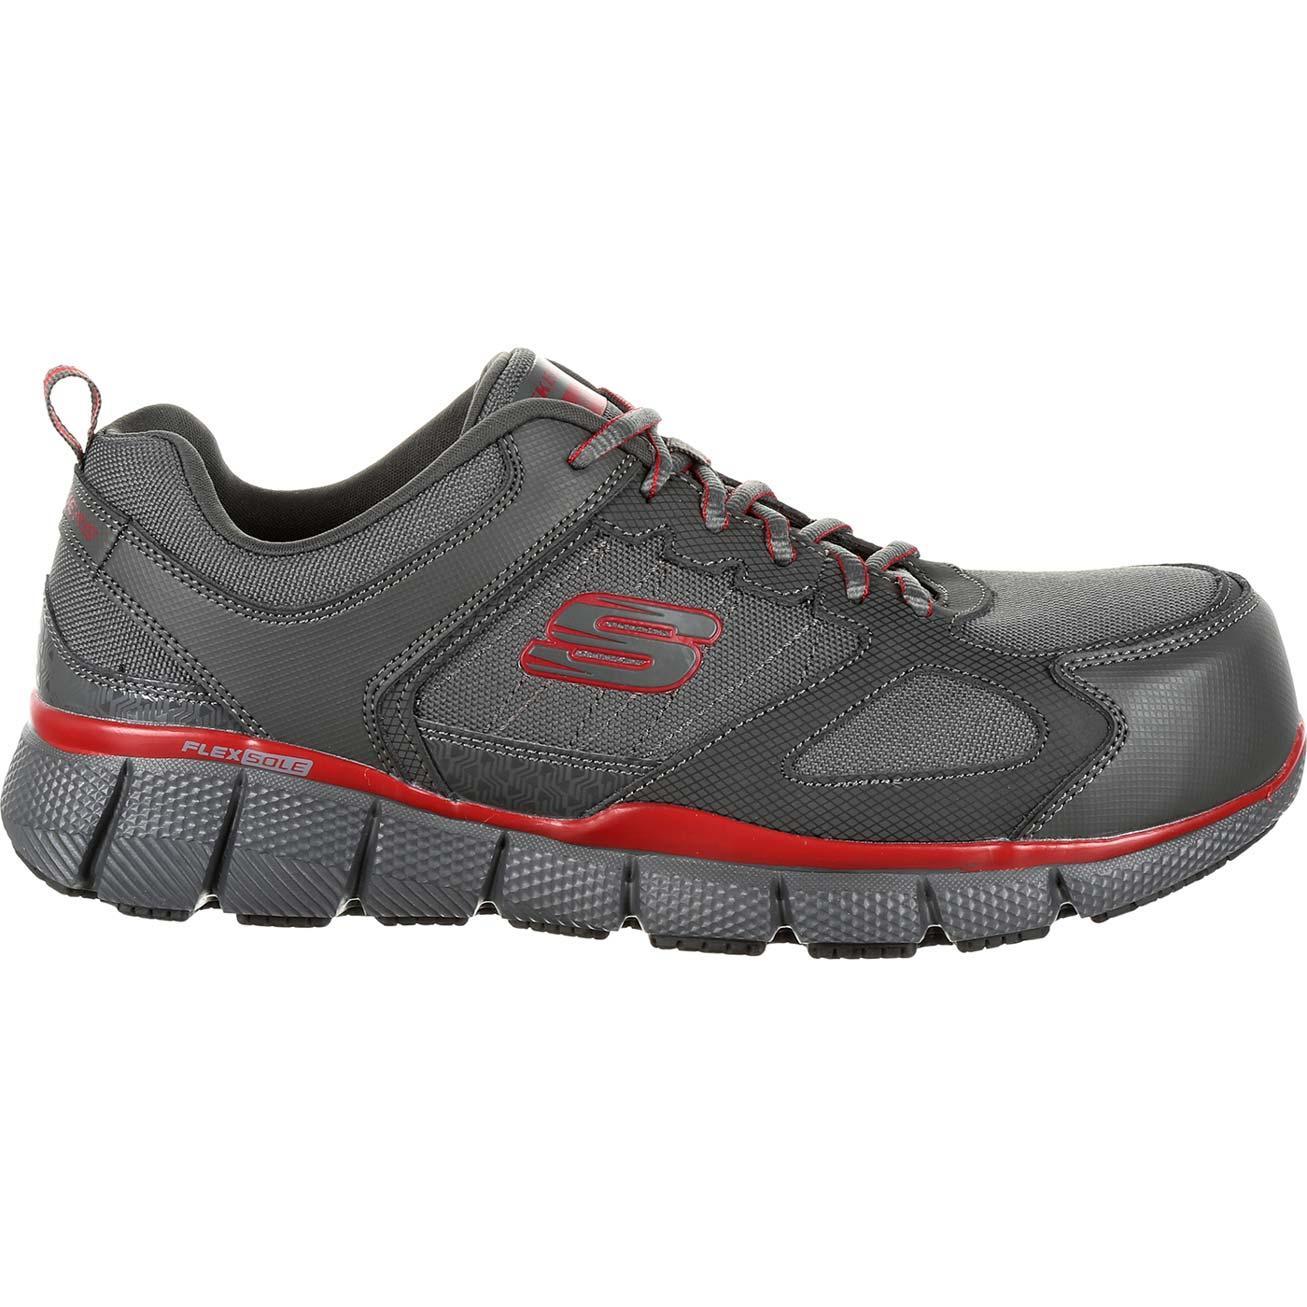 Skechers Black Shoes Work Men Memory Foam Slip Resistant Comp Toe EH Safe 77132